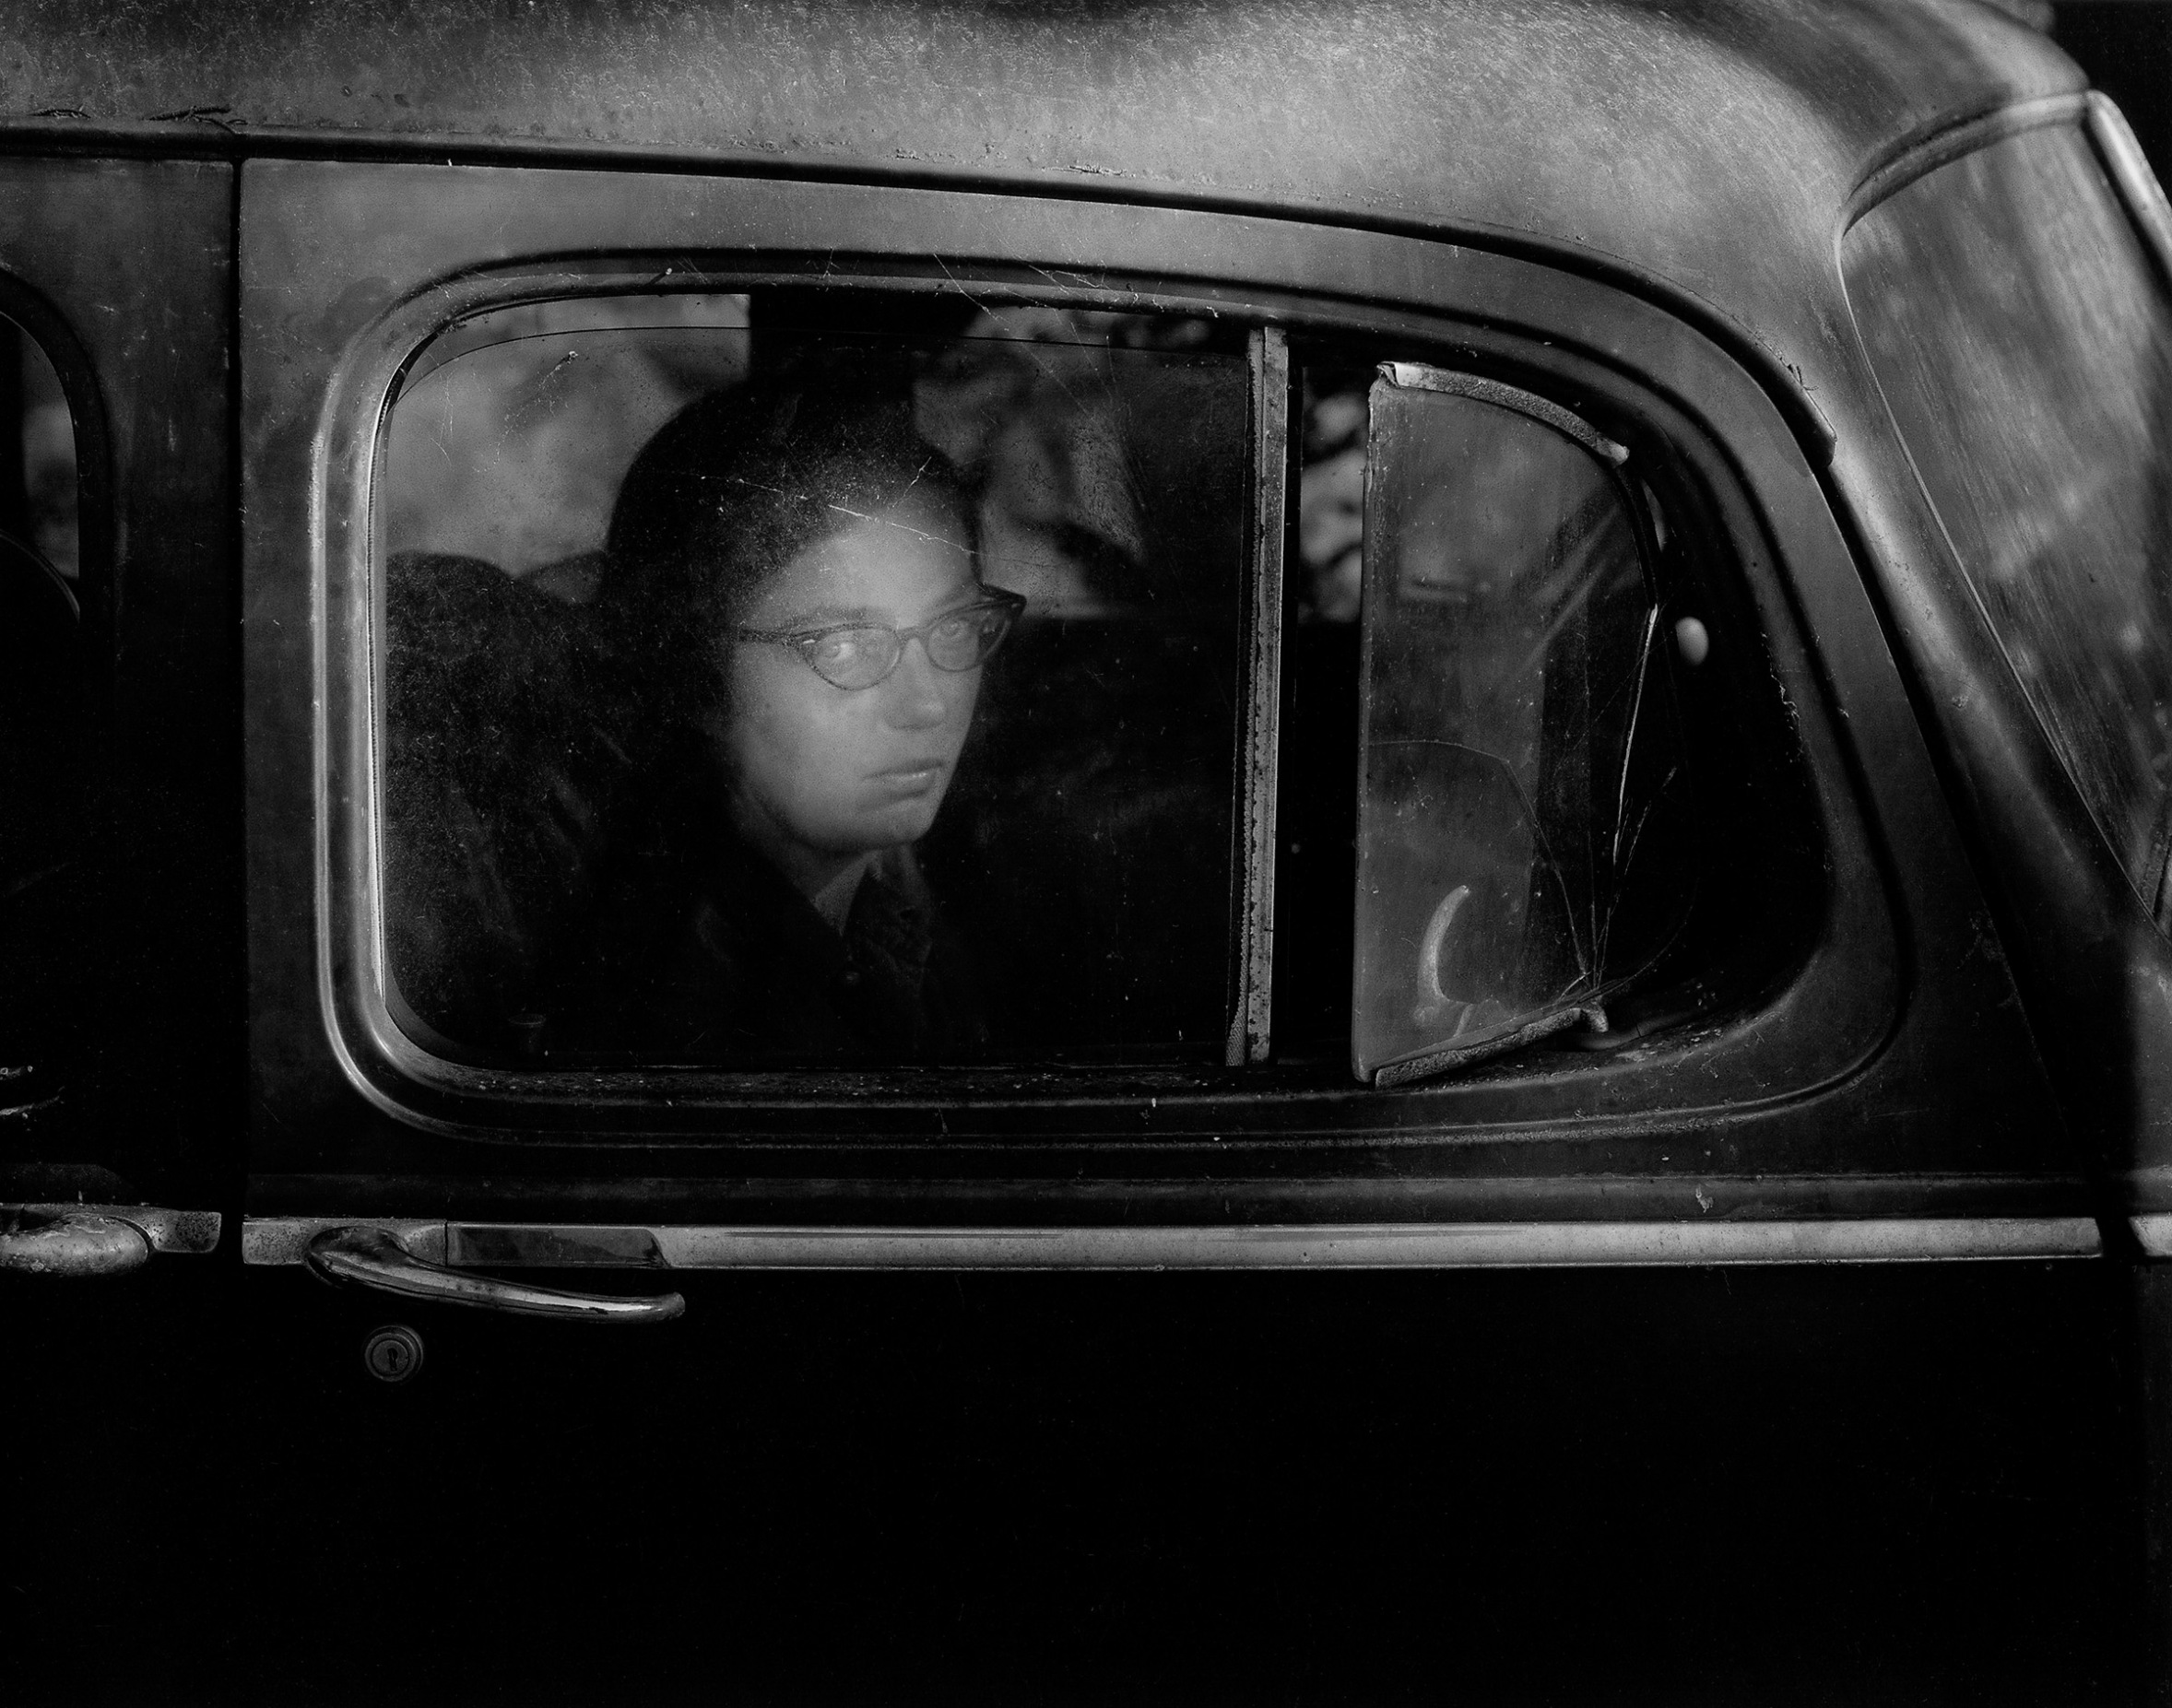 Girl in Car Wynn Bullock © Bullock Family Photography, LLC